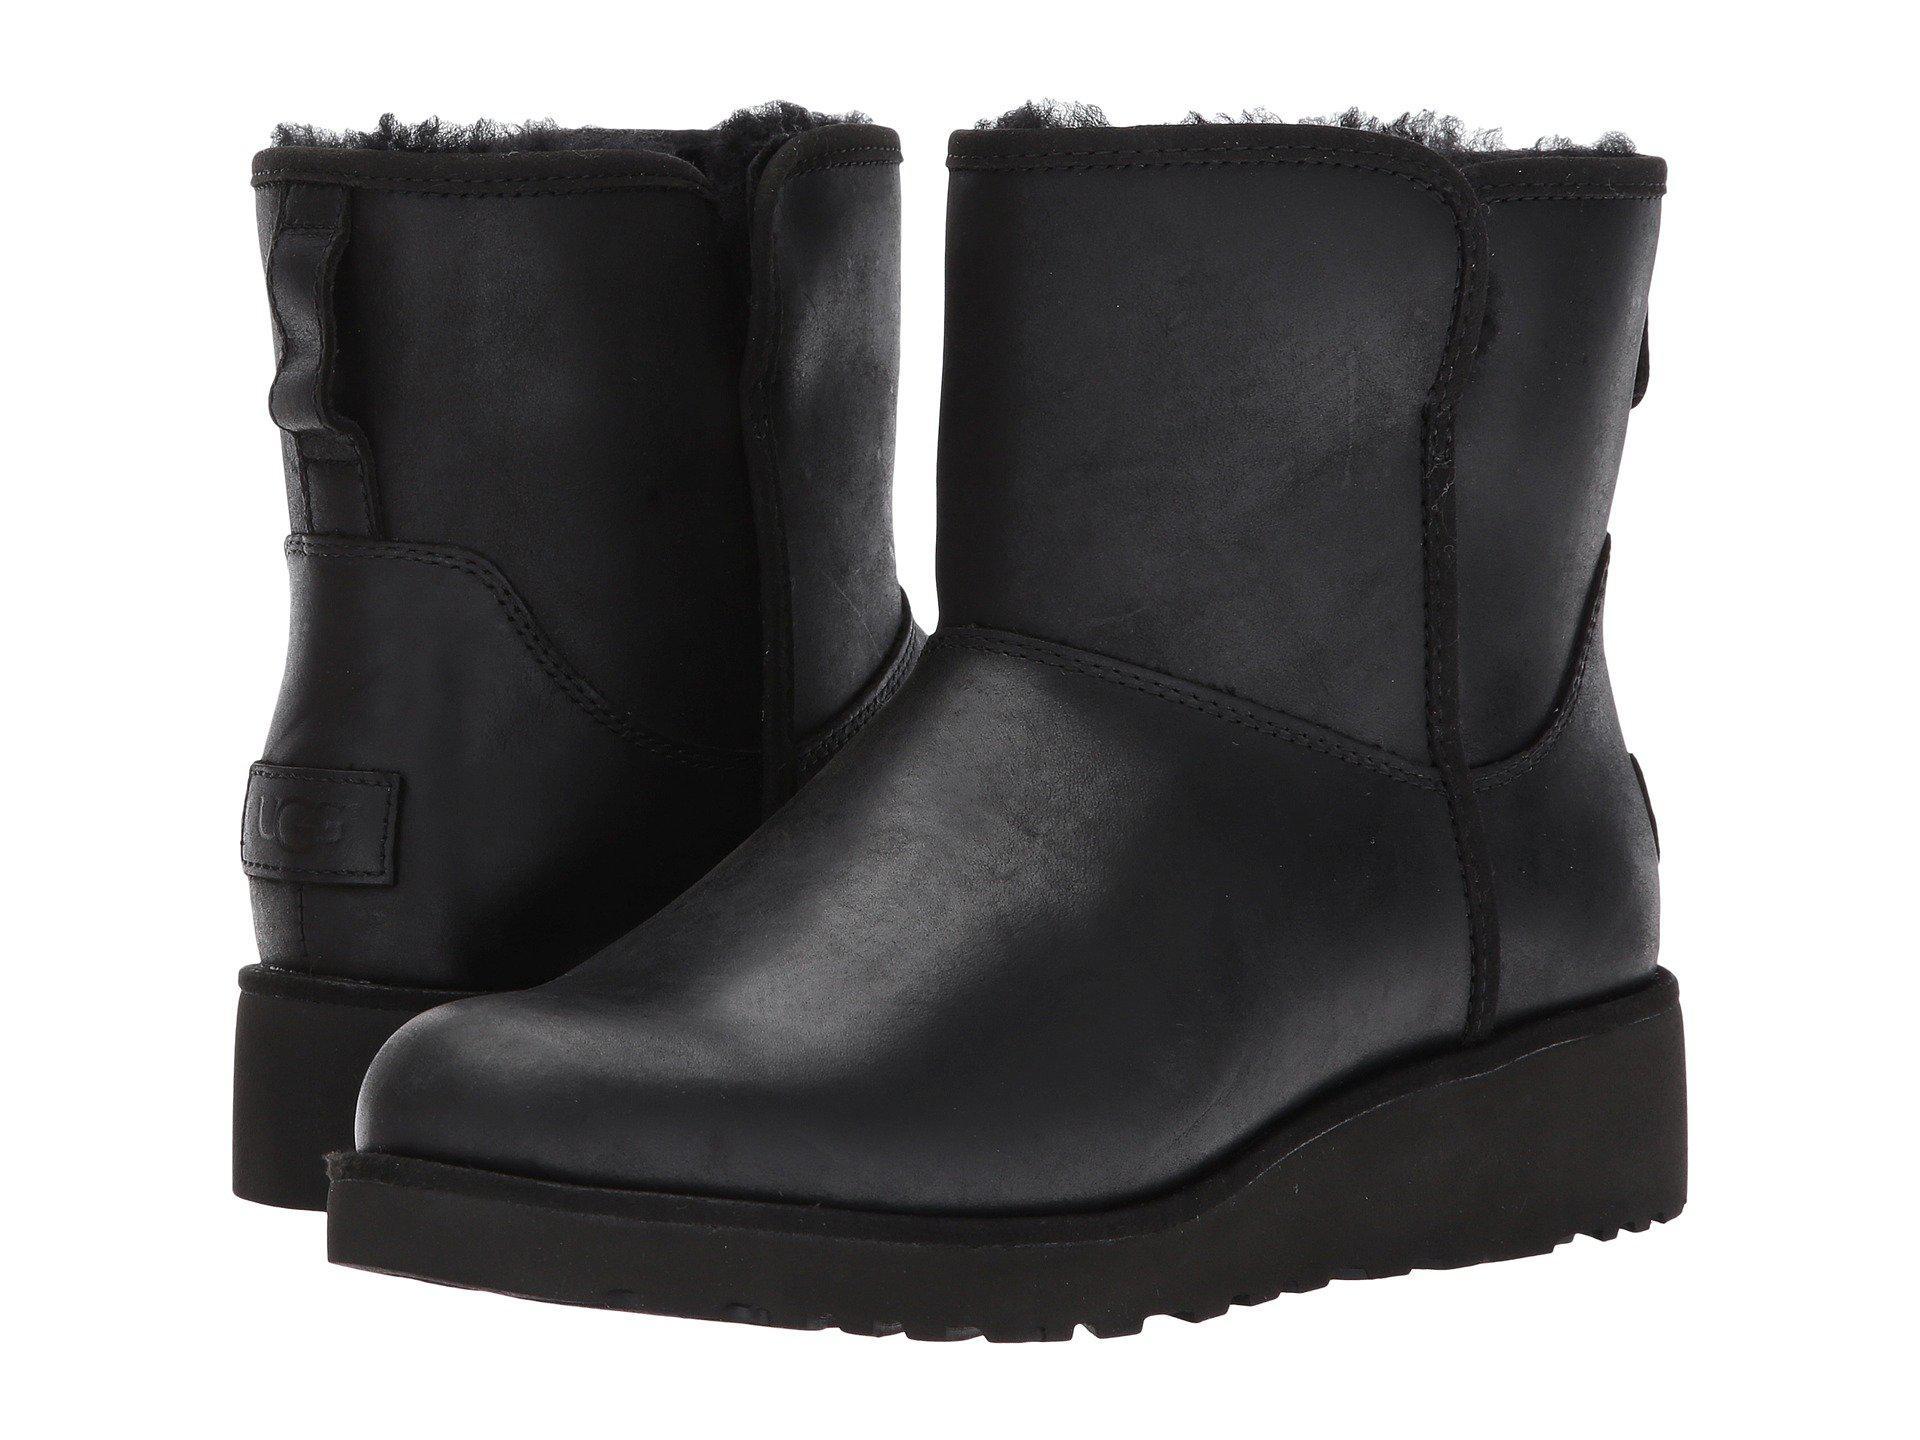 111611227b1 Lyst - UGG Kristin Leather in Black